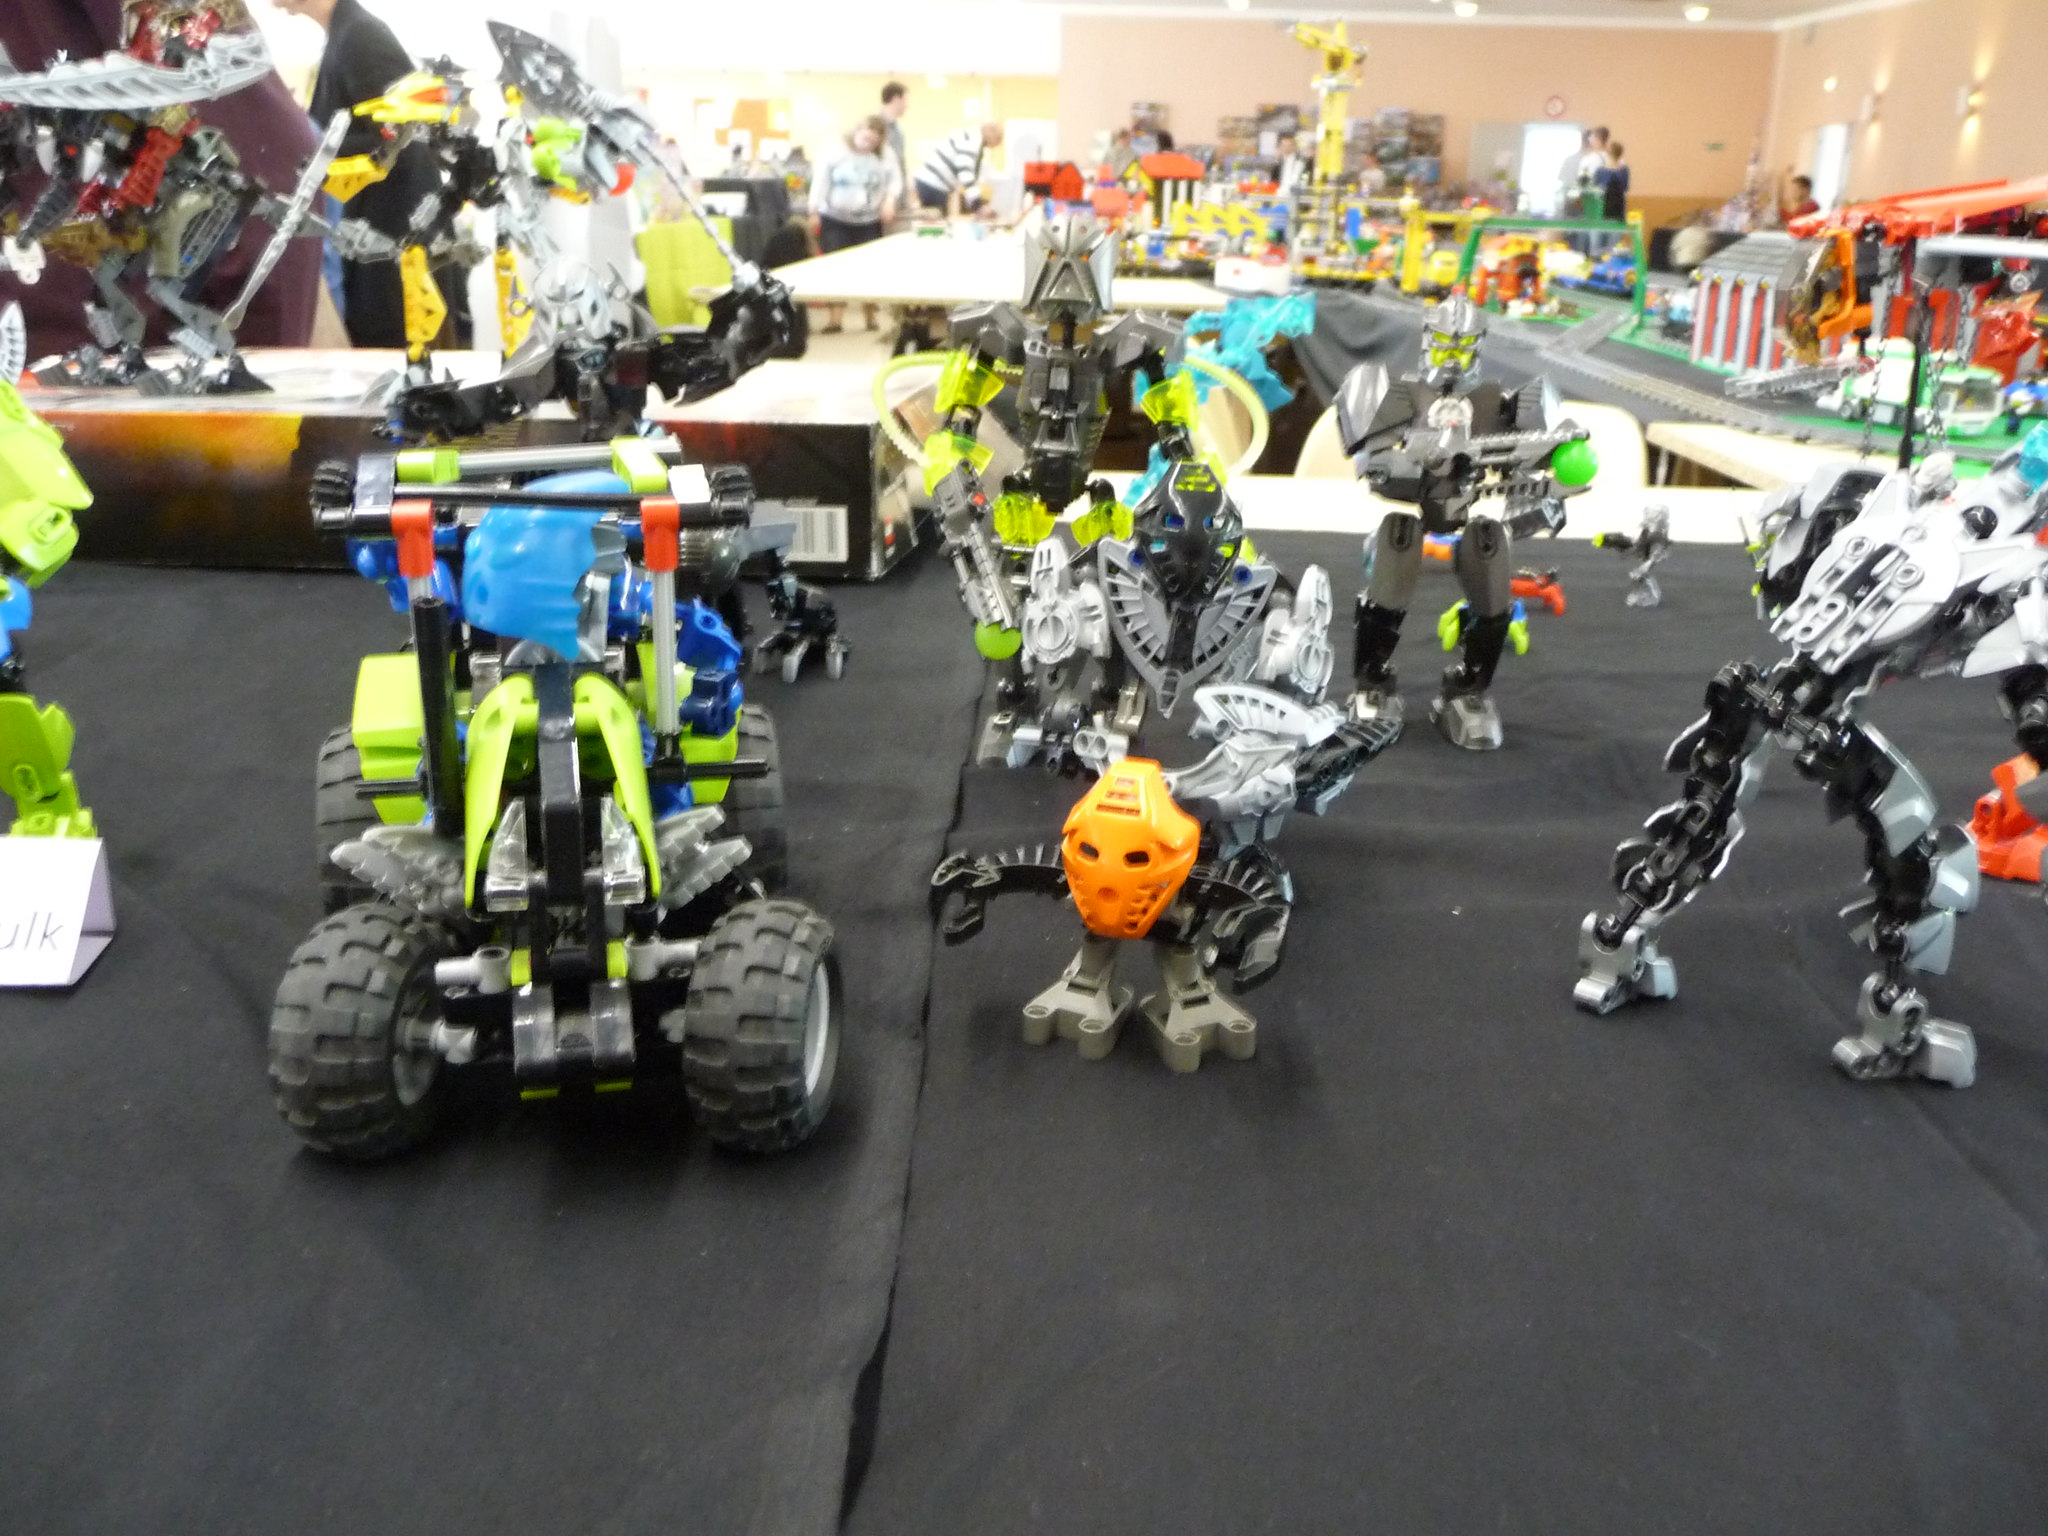 [Expo] Compte-rendu de la Briqu'Expo de Mulsanne 17293108619_76e8fa0dd8_k